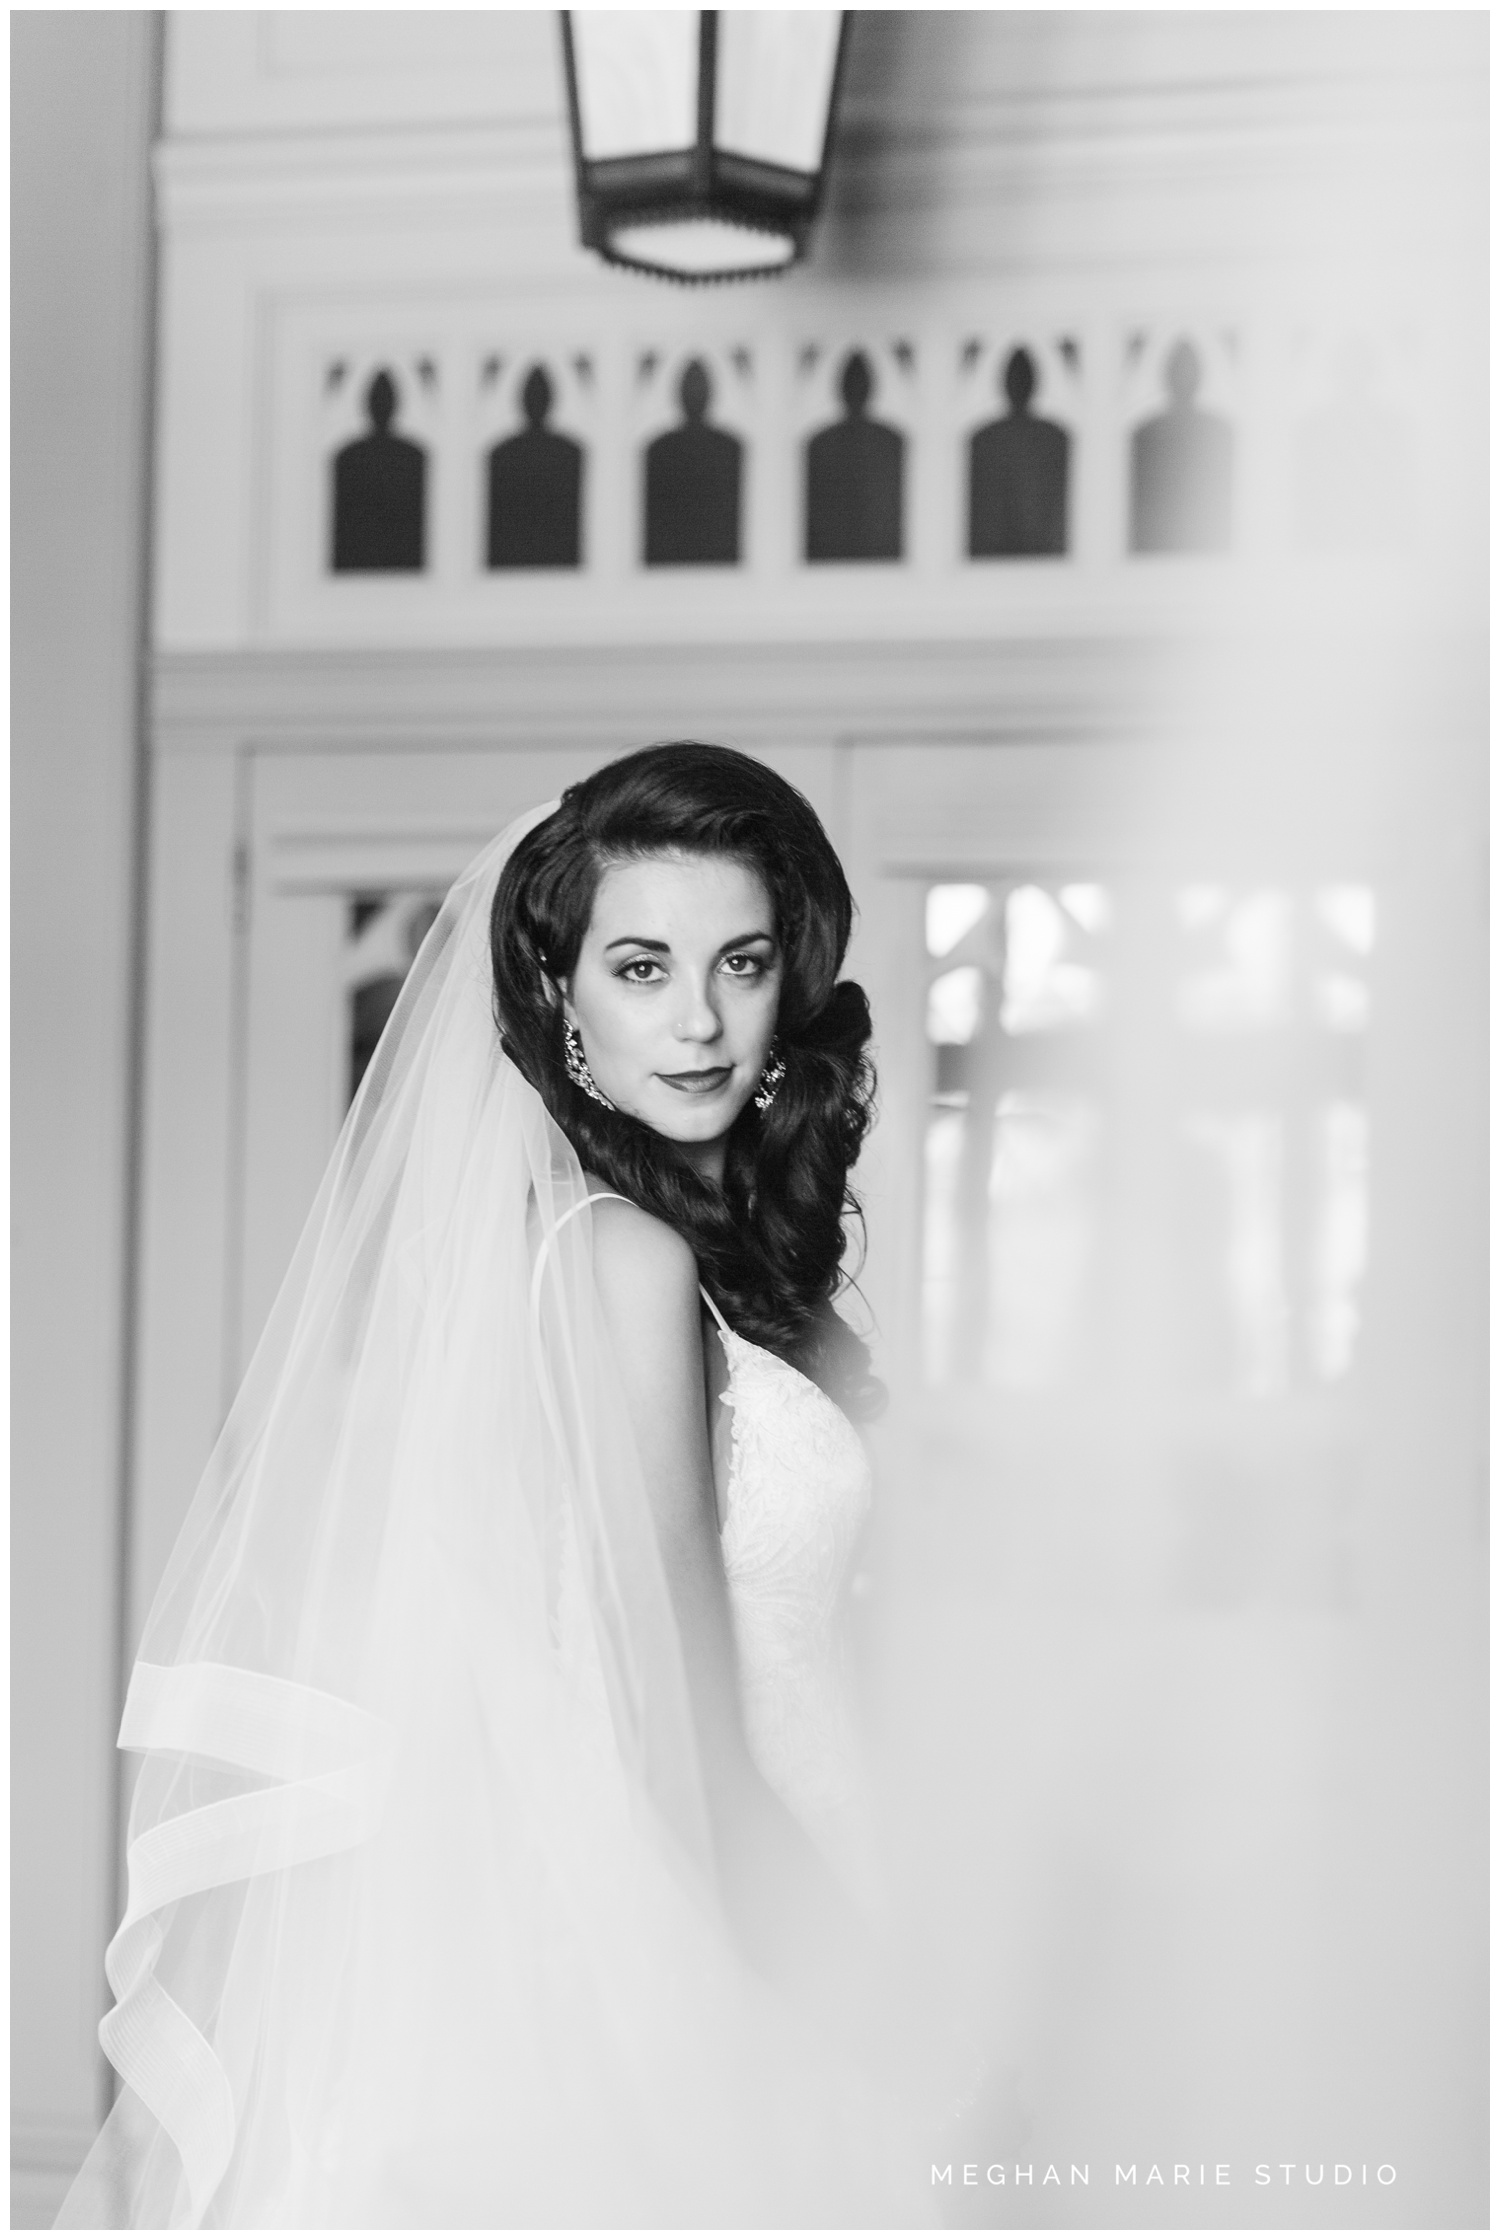 meghan marie studio wedding photographer ohio troy dayton columbus fort loramie st michael hall demange ken midmark elegant black suits metallics hollywood soft glam family wedding_0492.jpg